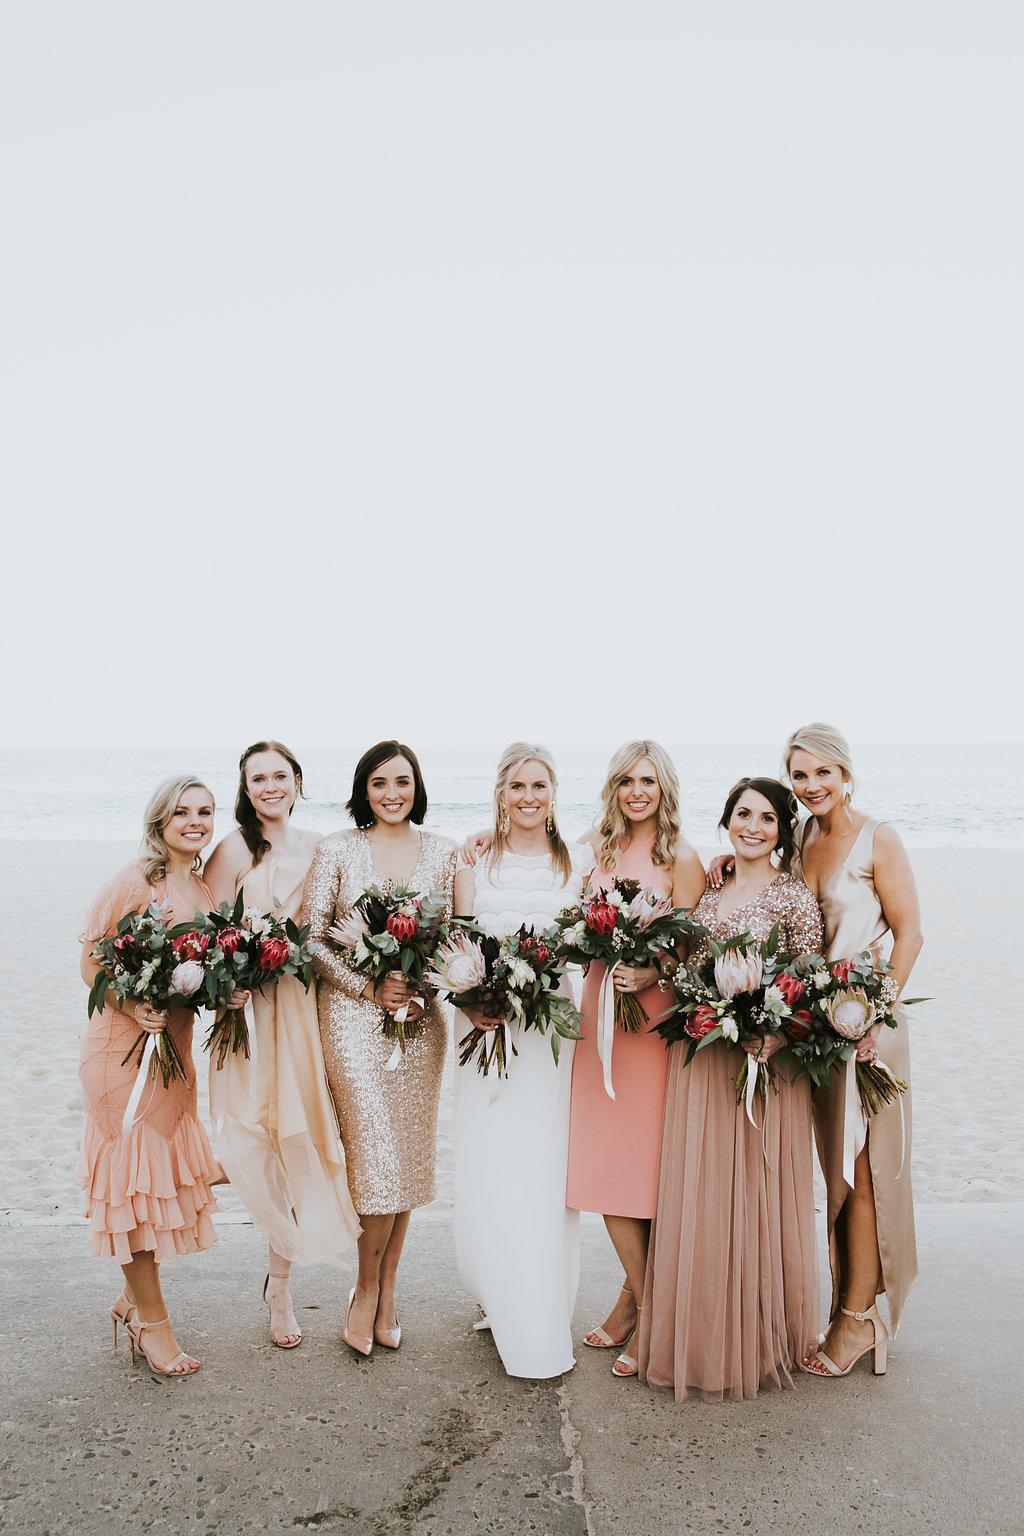 anna turner photography wedding flowers florals blooms bouquets sydney floral designer